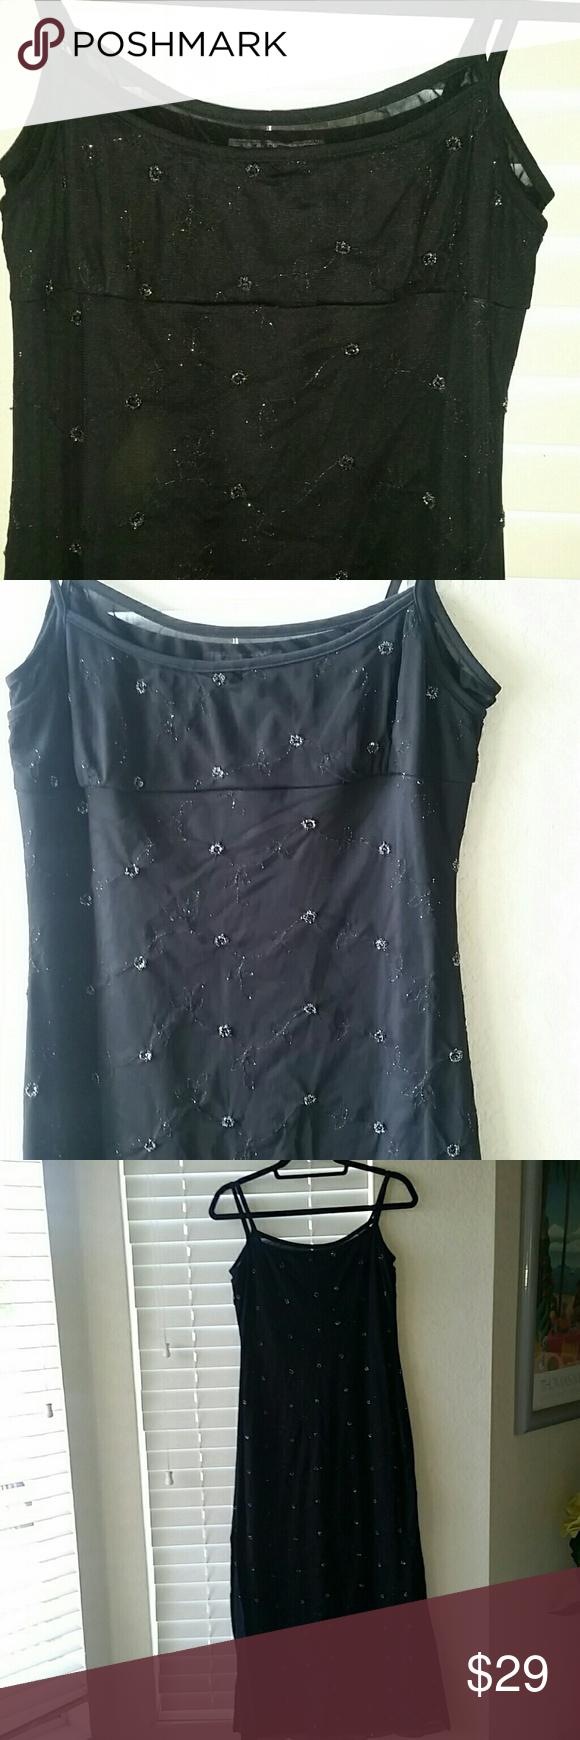 Midlength black diamond embellished dress embellished dress mid